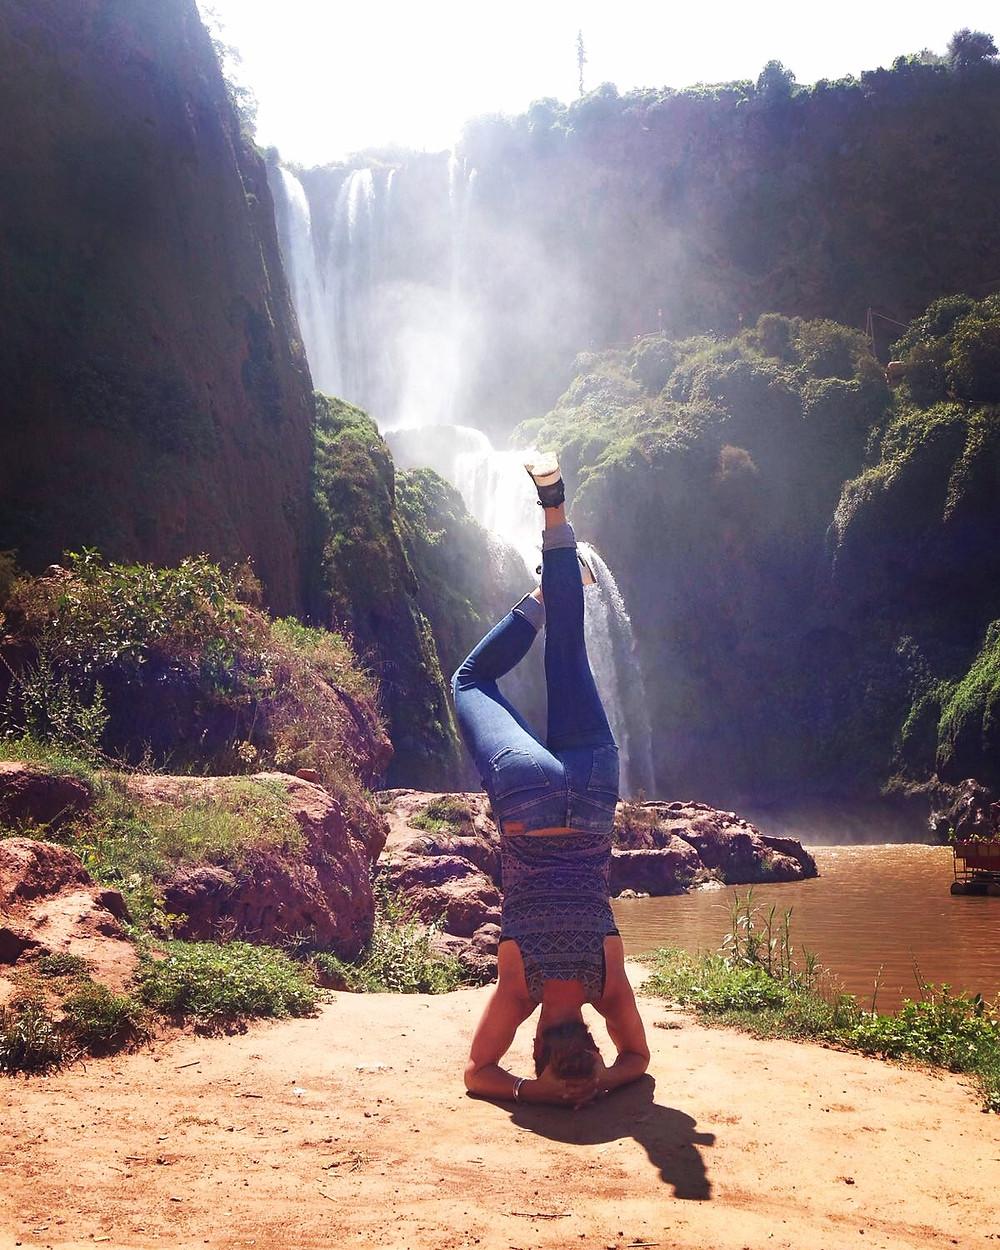 Kopfstand am Wasserfall